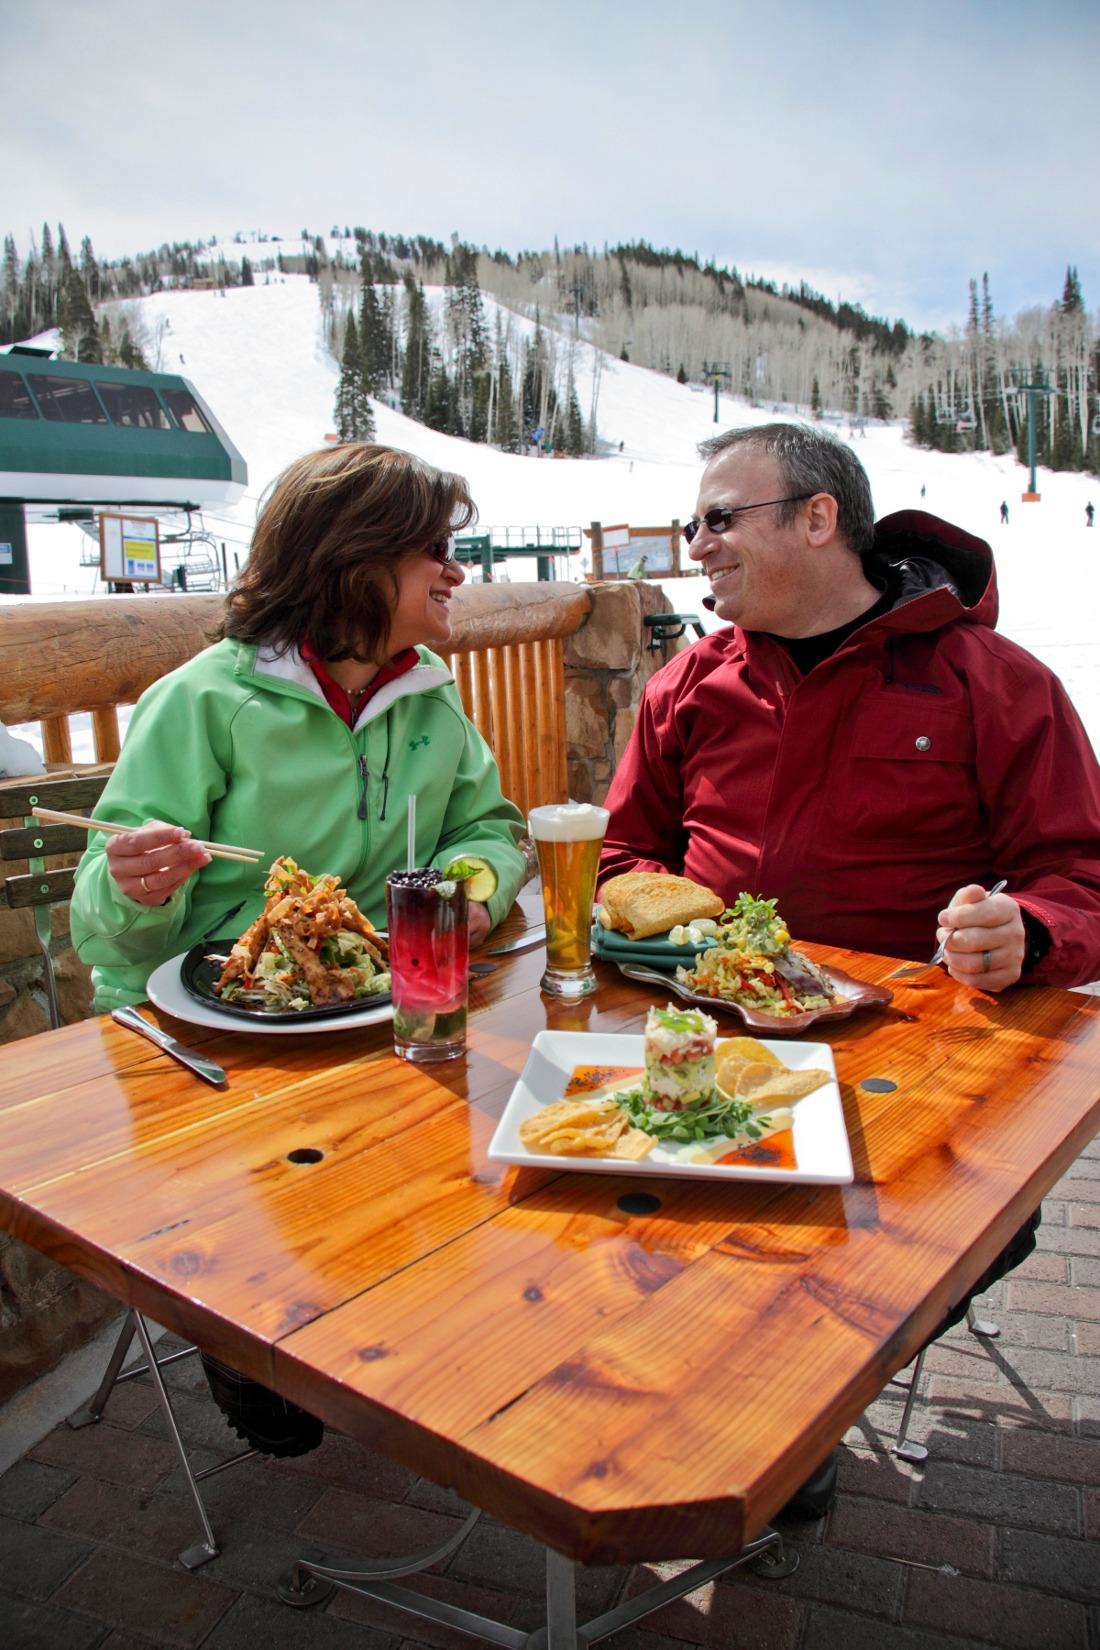 Royal Street Cafe at Deer Valley Resort, lunch at Deer Valley, patio images of Deer Valley, dining images at Deer Valley